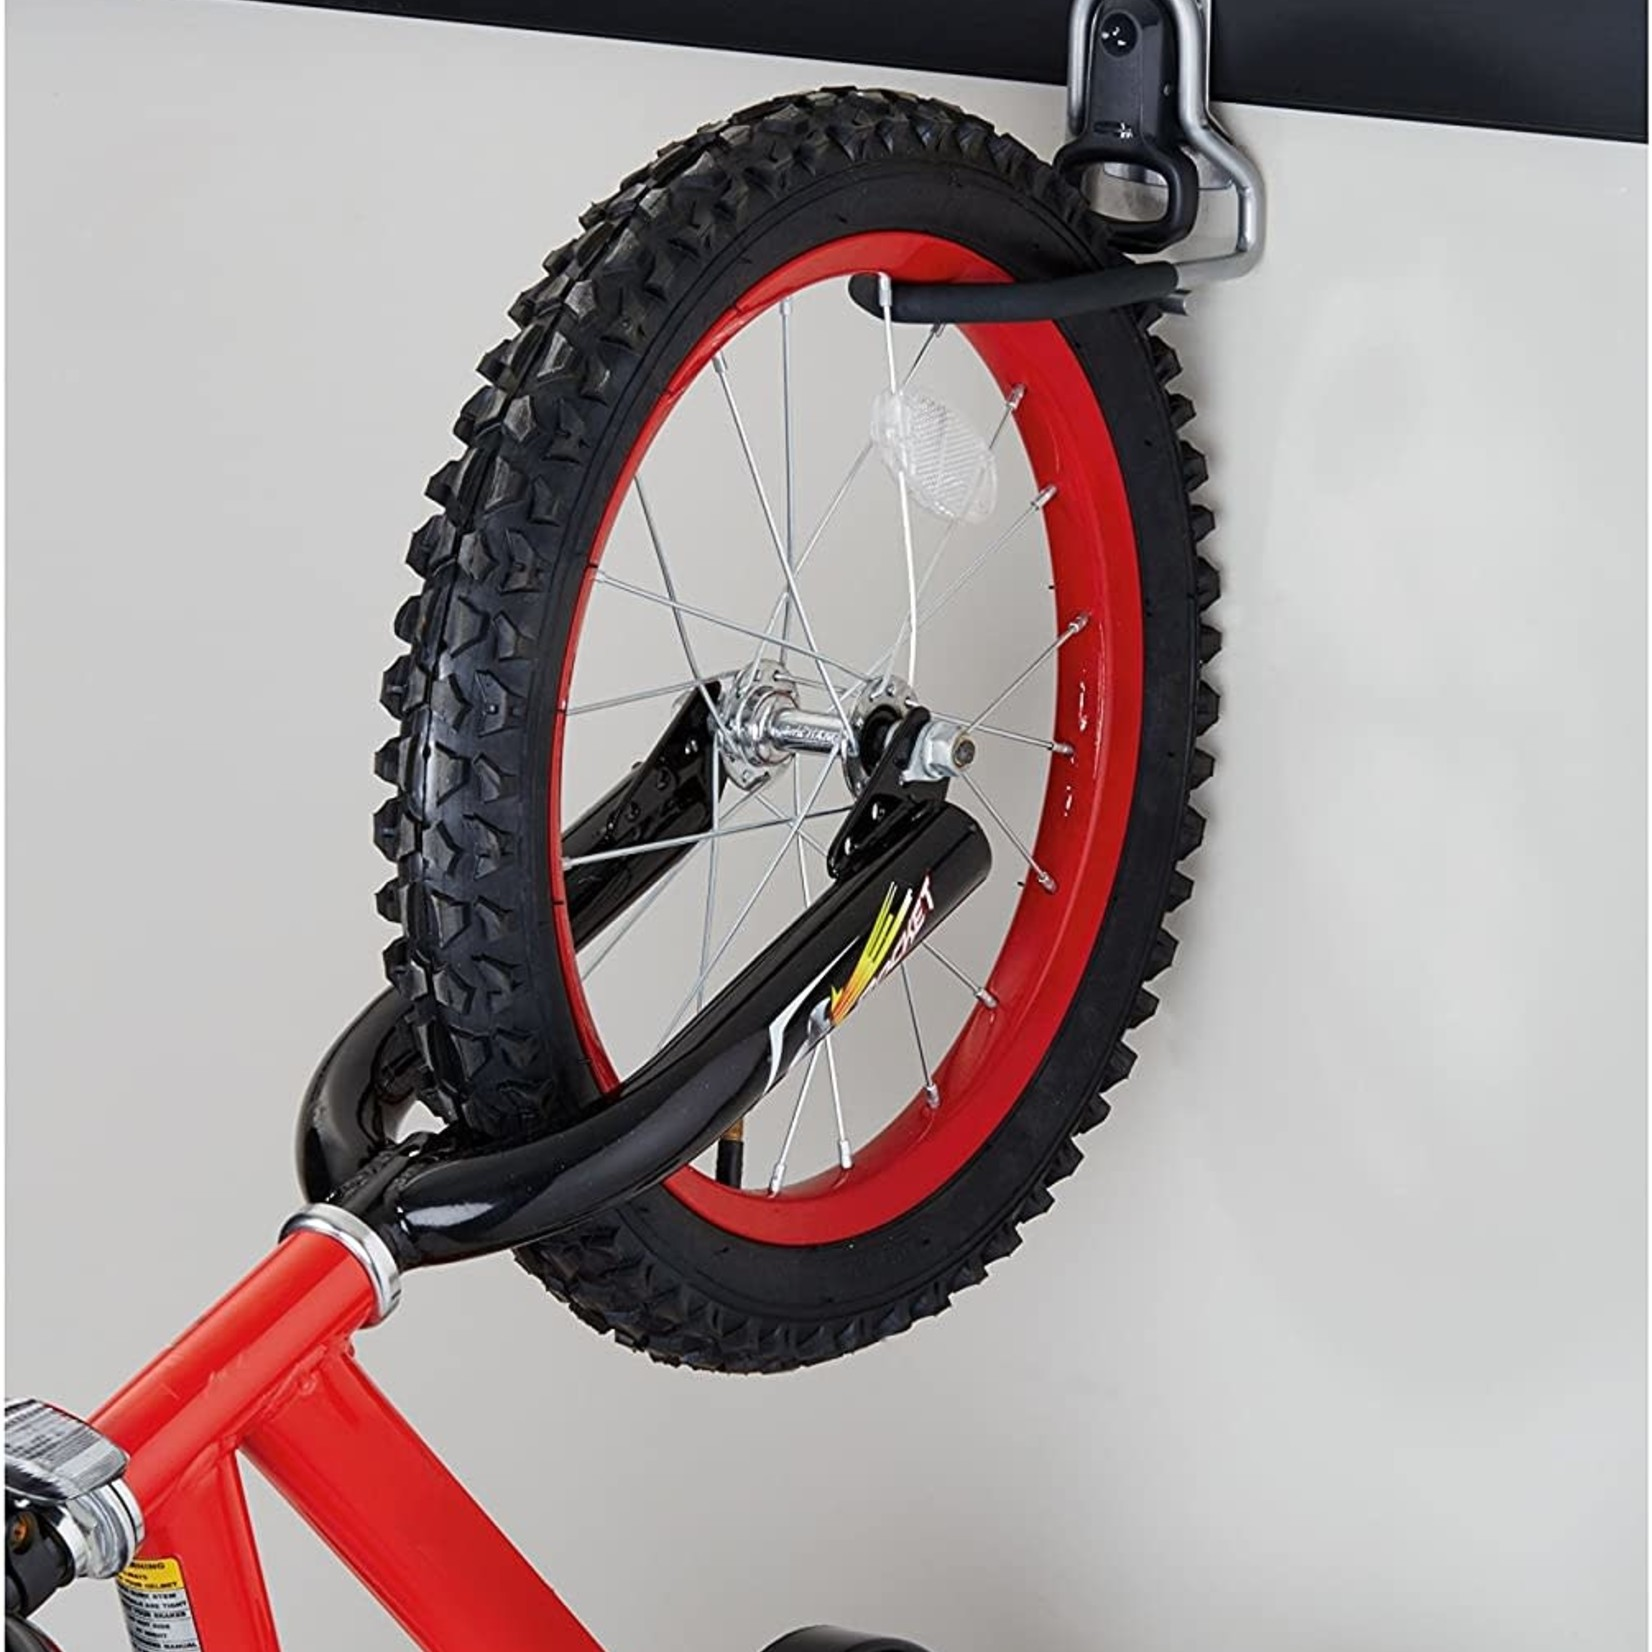 Rubbermaid 5E02 Fasttrack Vertical Bike Hook